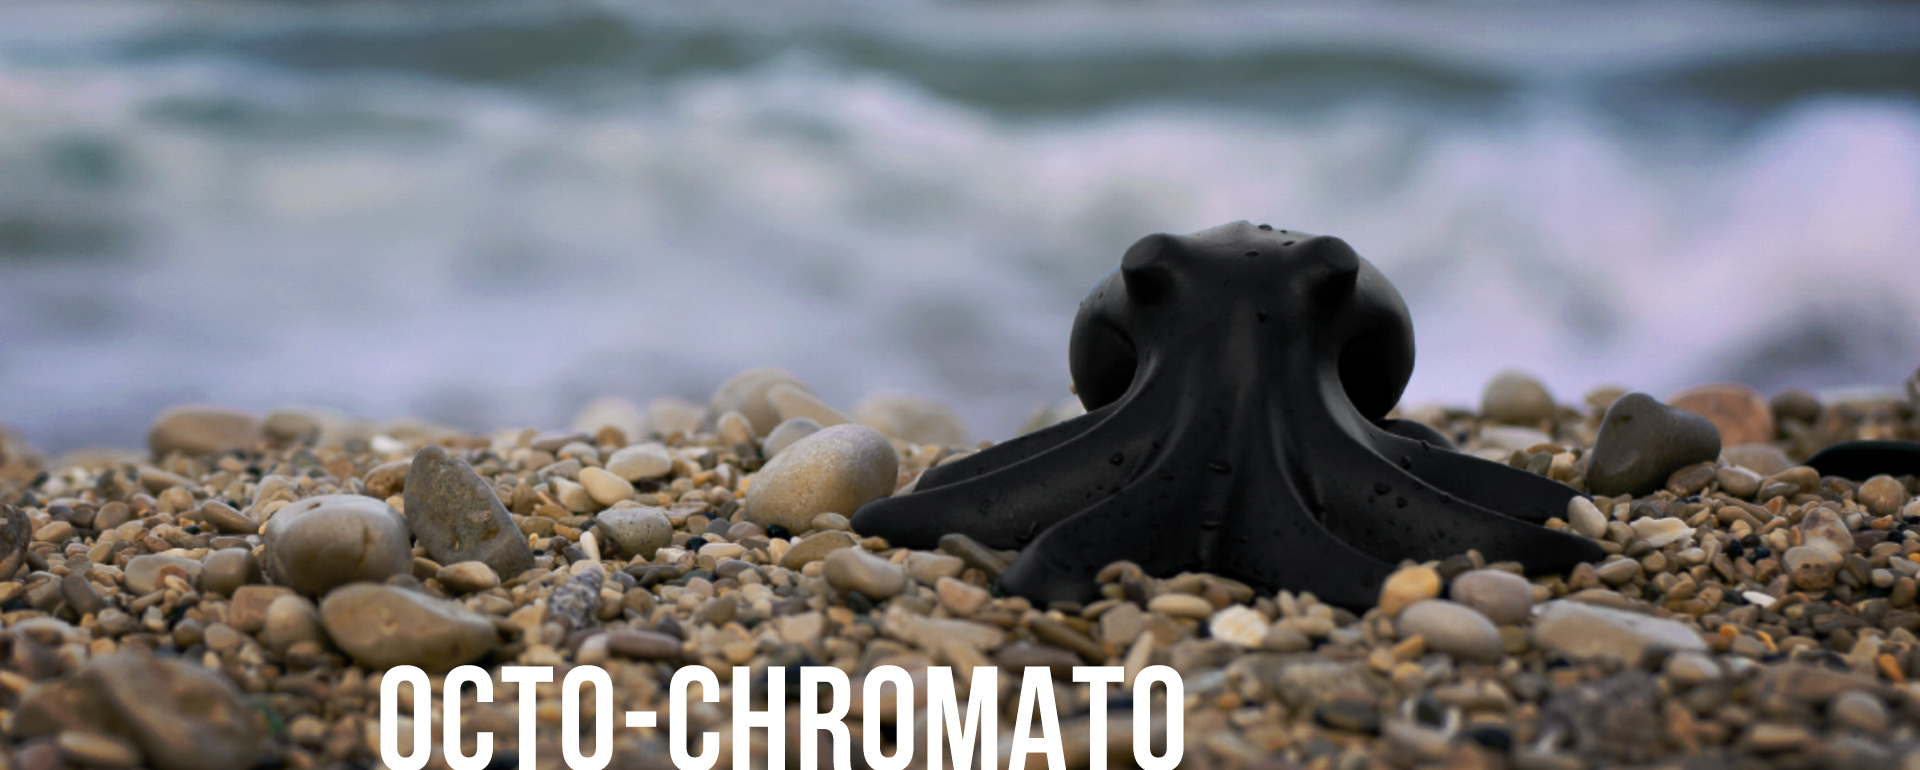 NOIR_Banniere_Chromato